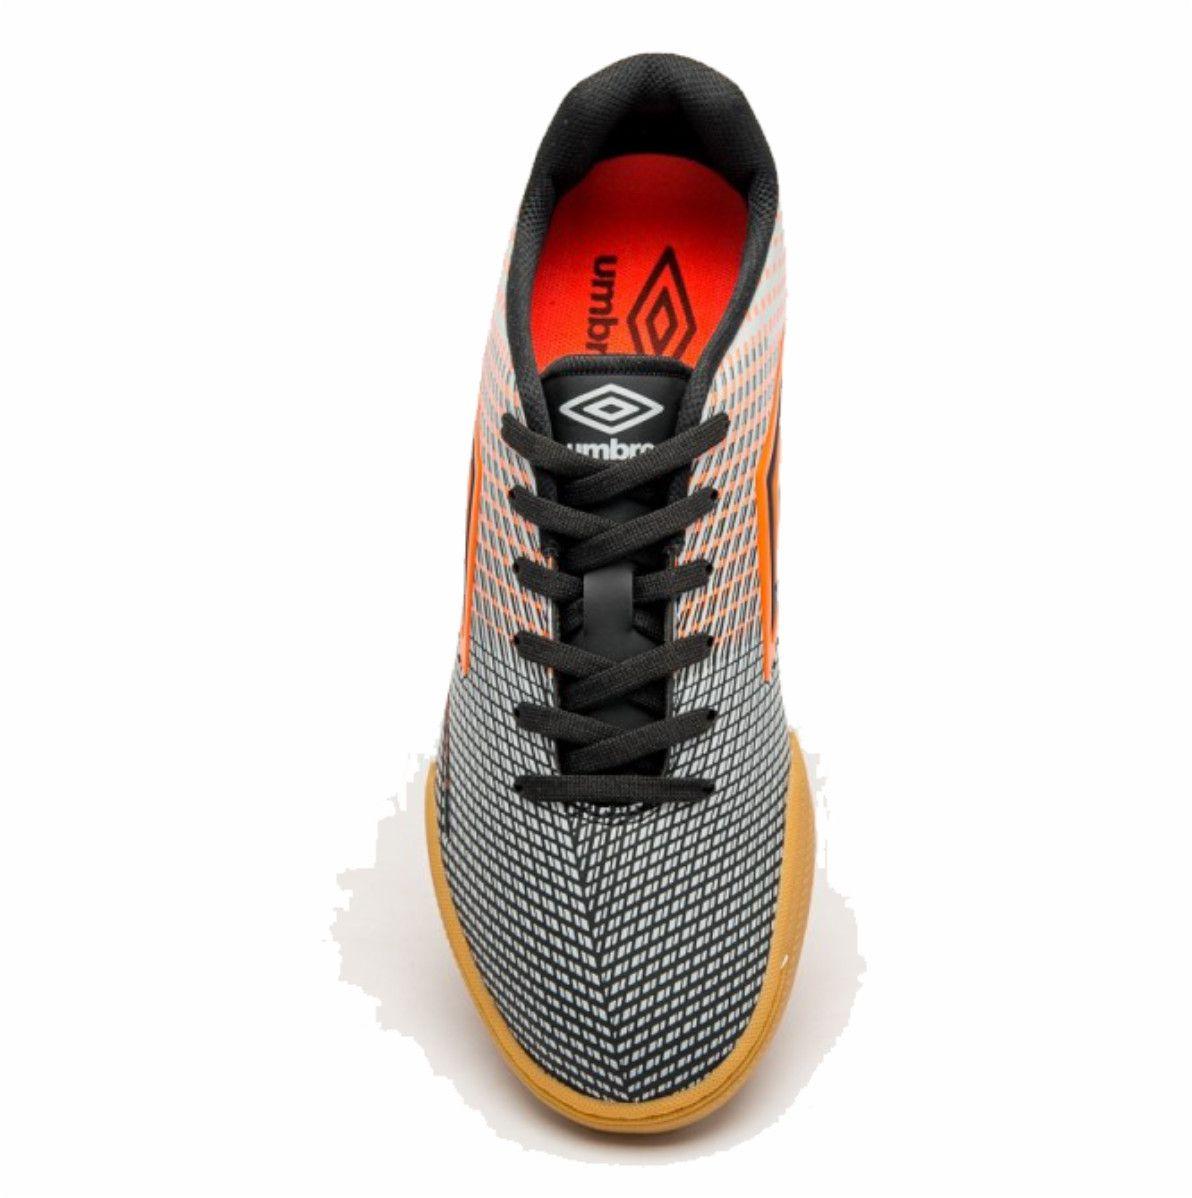 Tenis Umbro Speed Sonic Indoor Futsal Preto Costurado